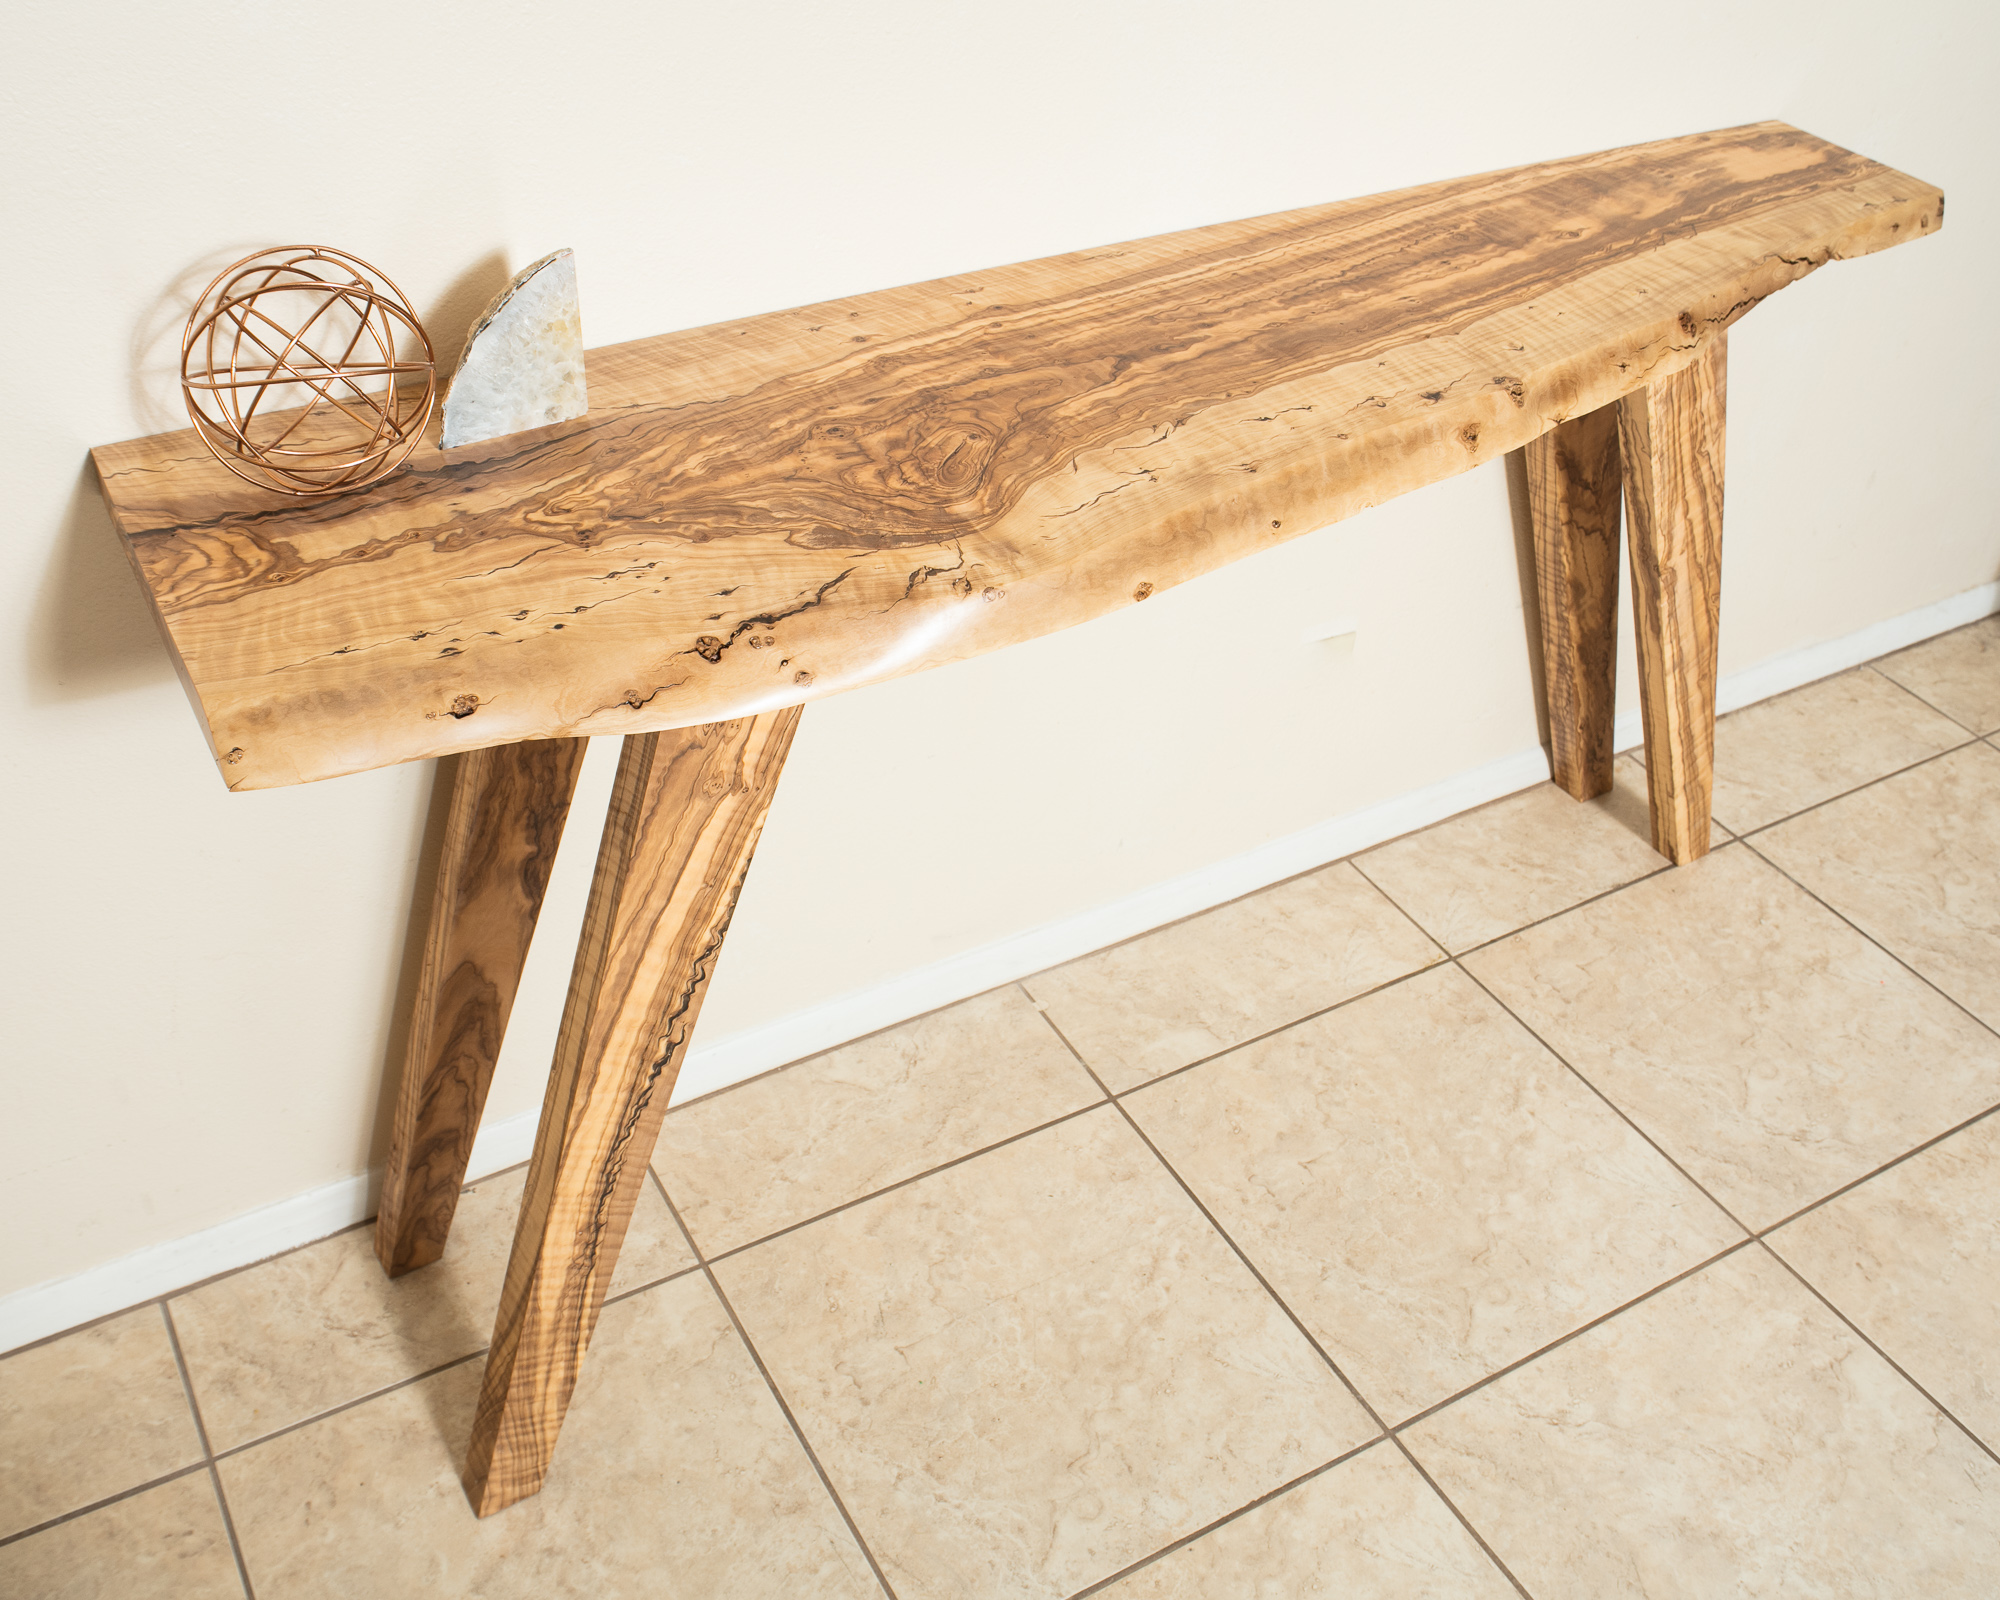 Olive Wood Live Edge Console Table | LumberLust Designs, Upscale Live Edge  Furniture Made In Arizona